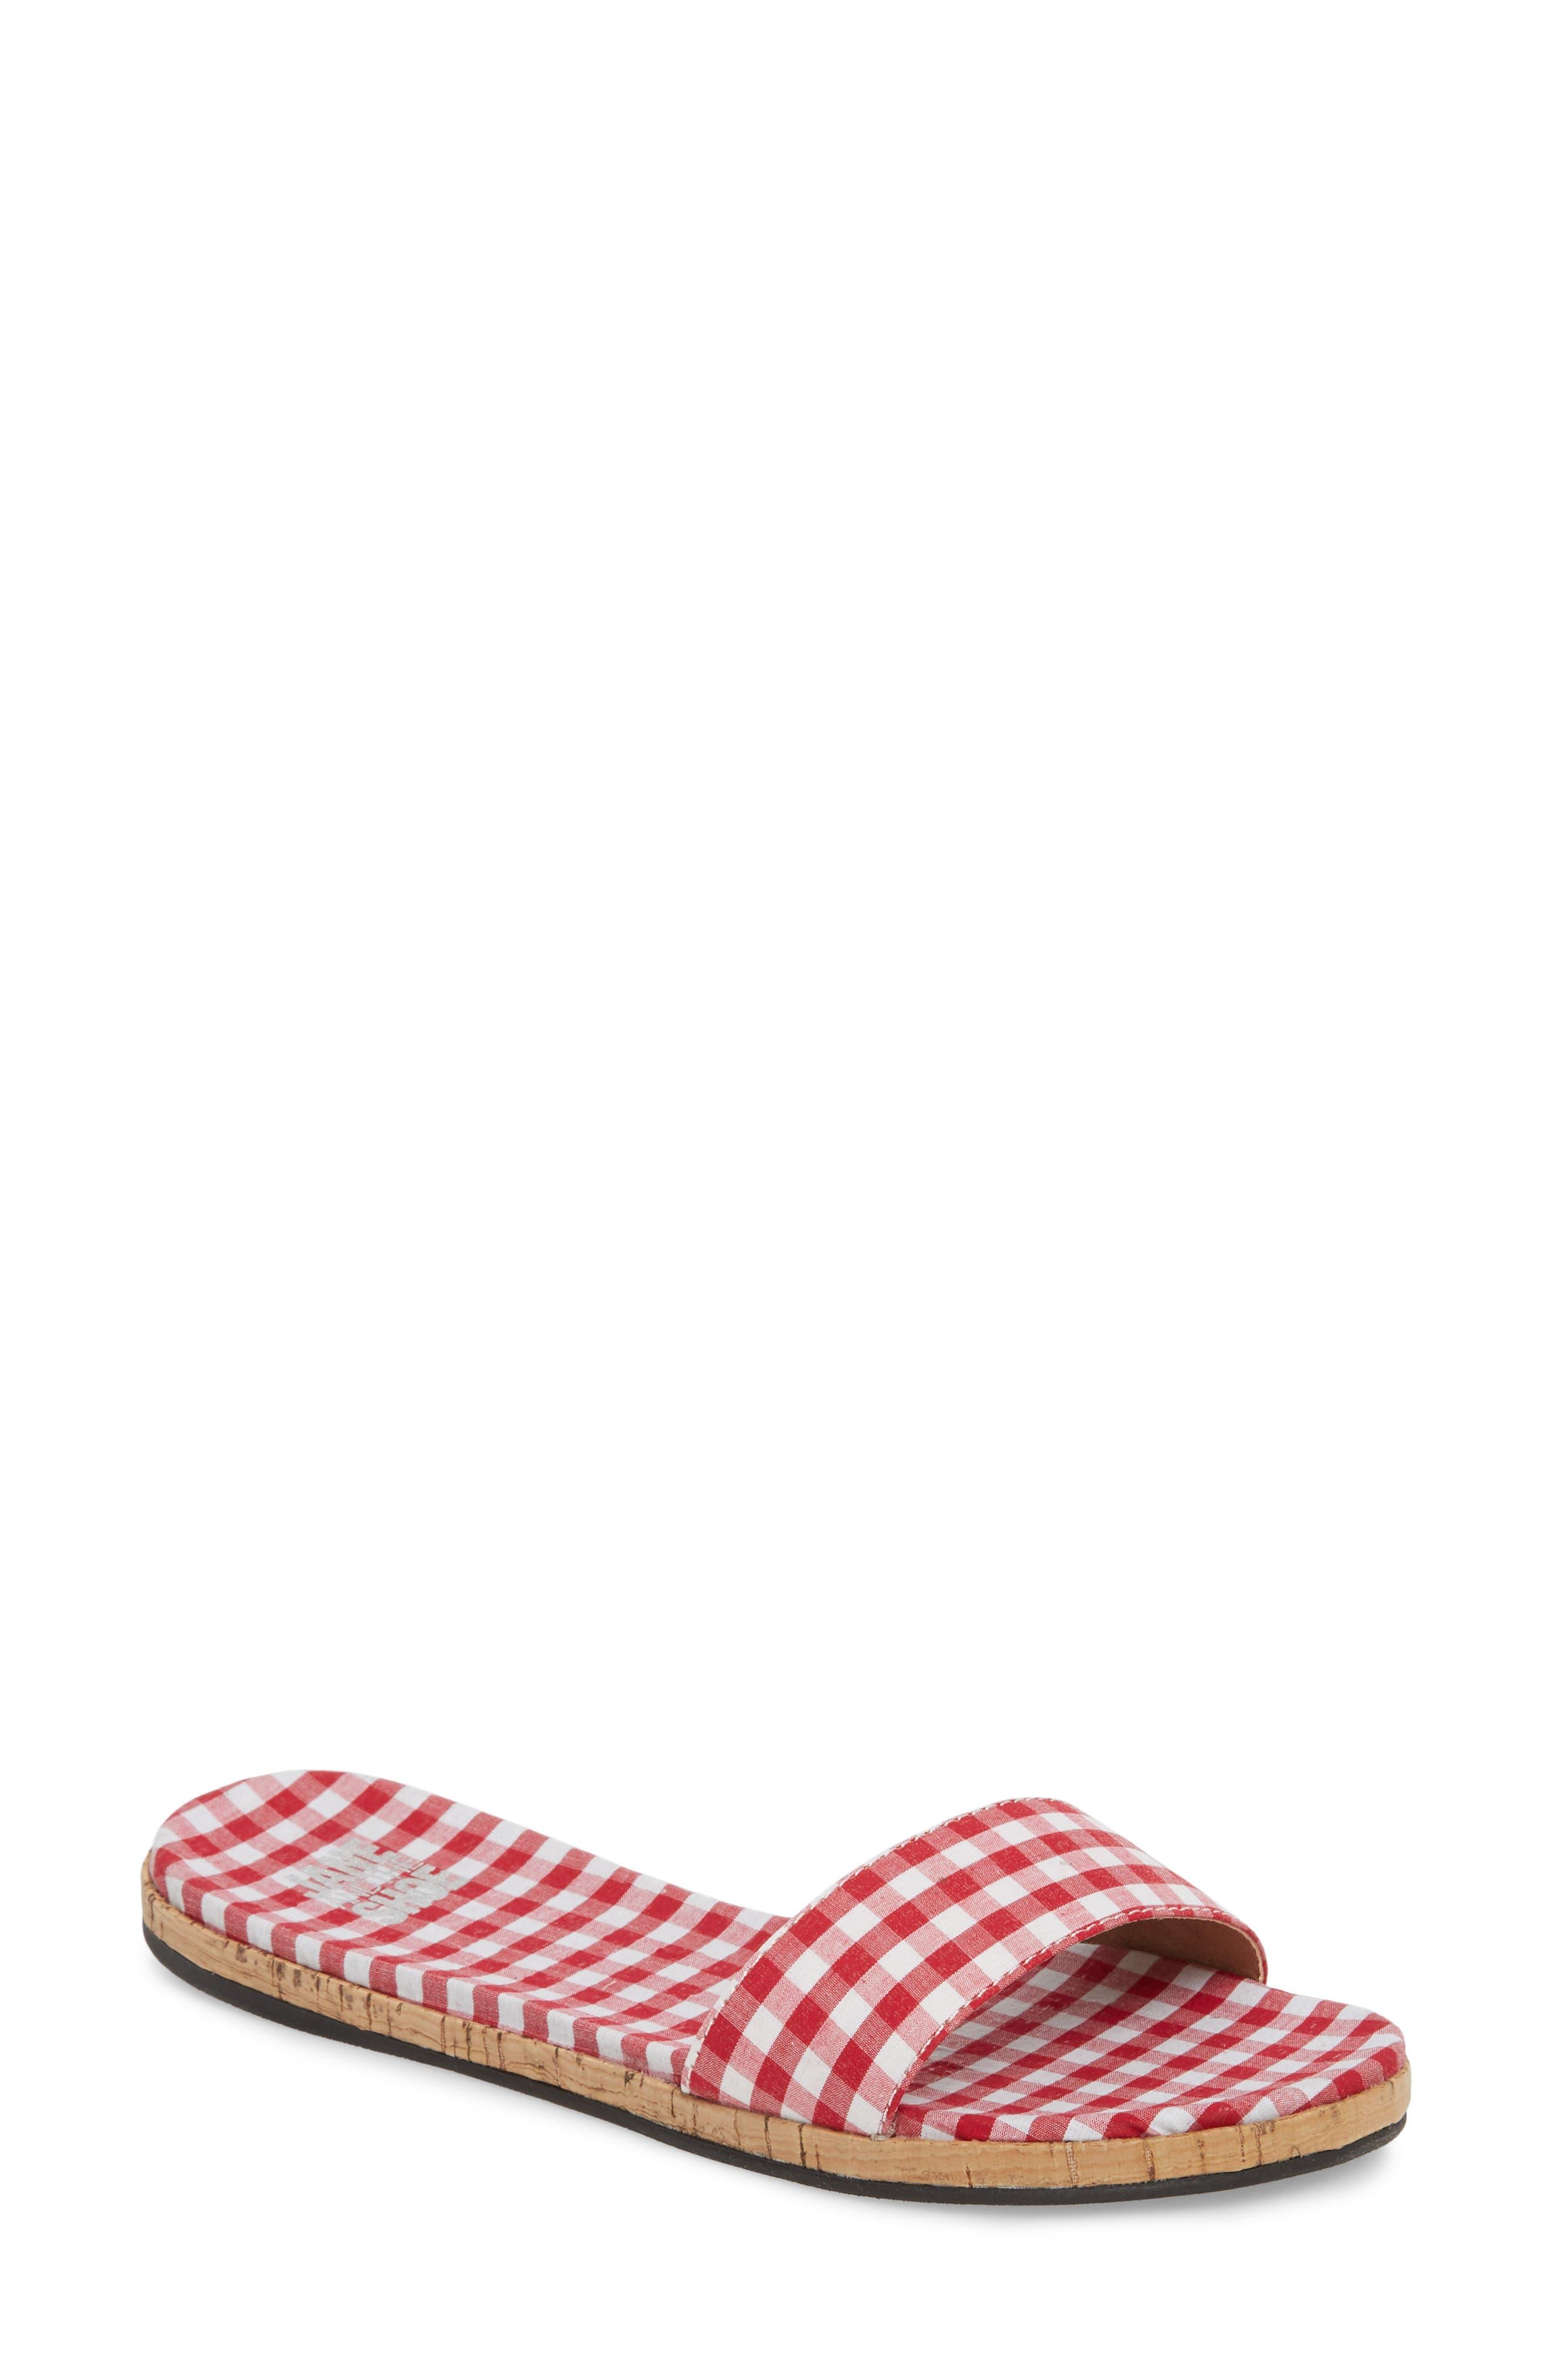 Jill Thin Band Slide Sandal,                             Main thumbnail 1, color,                             Red Gingham